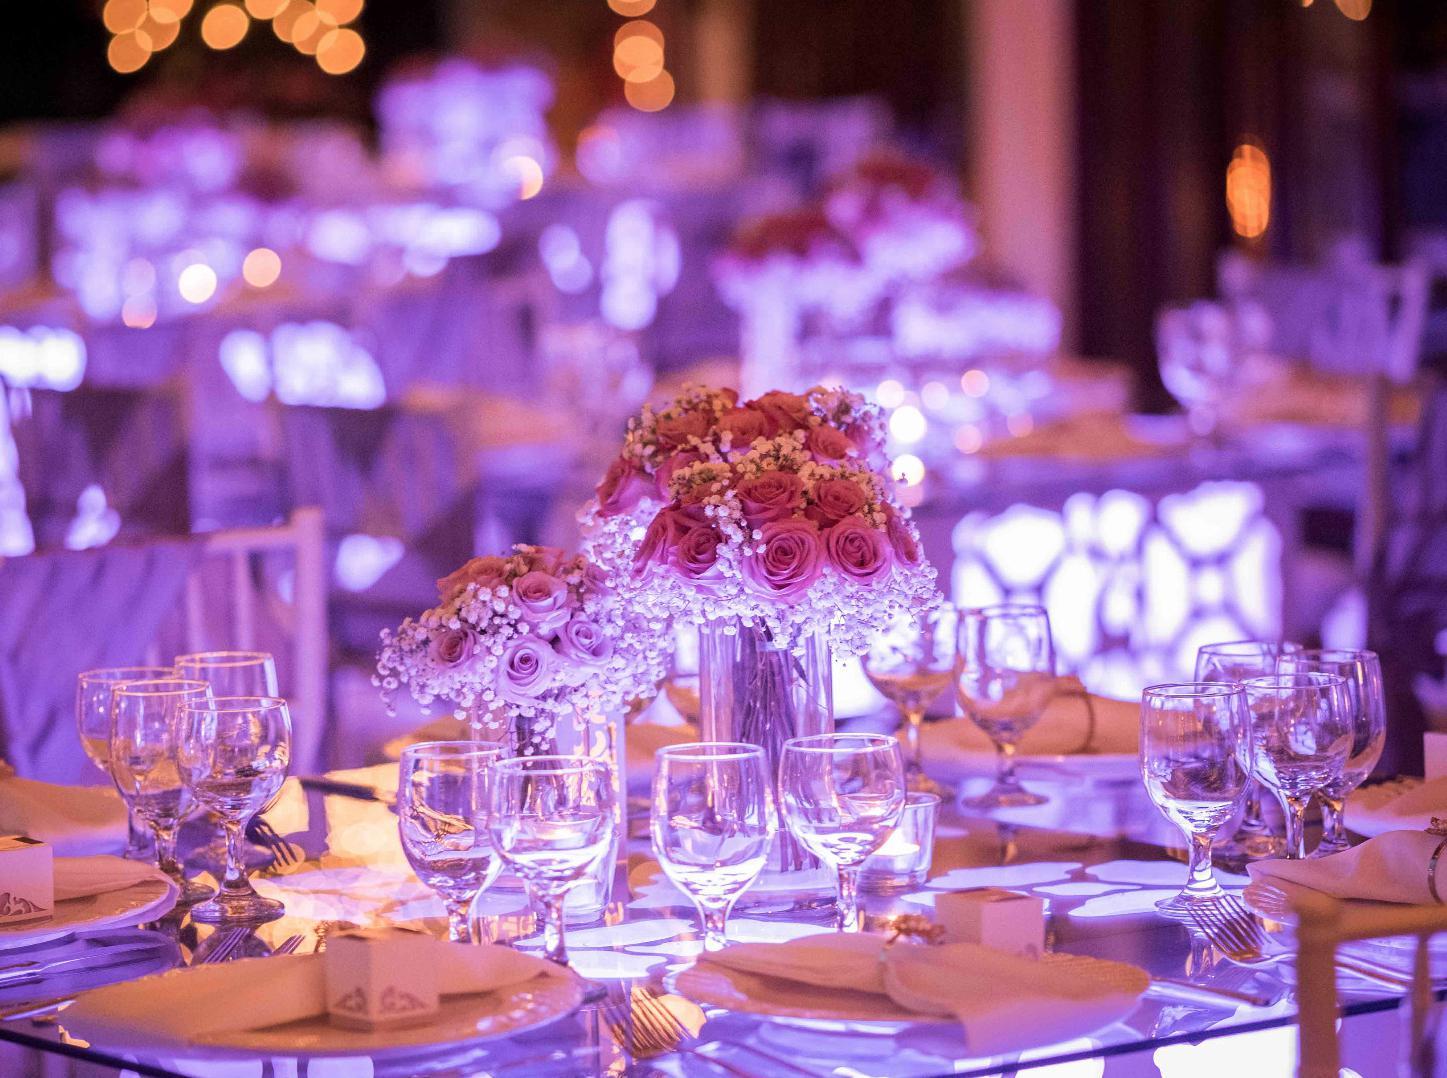 bodas-sin-clasificar-sin-tema-cuba-35862.jpg